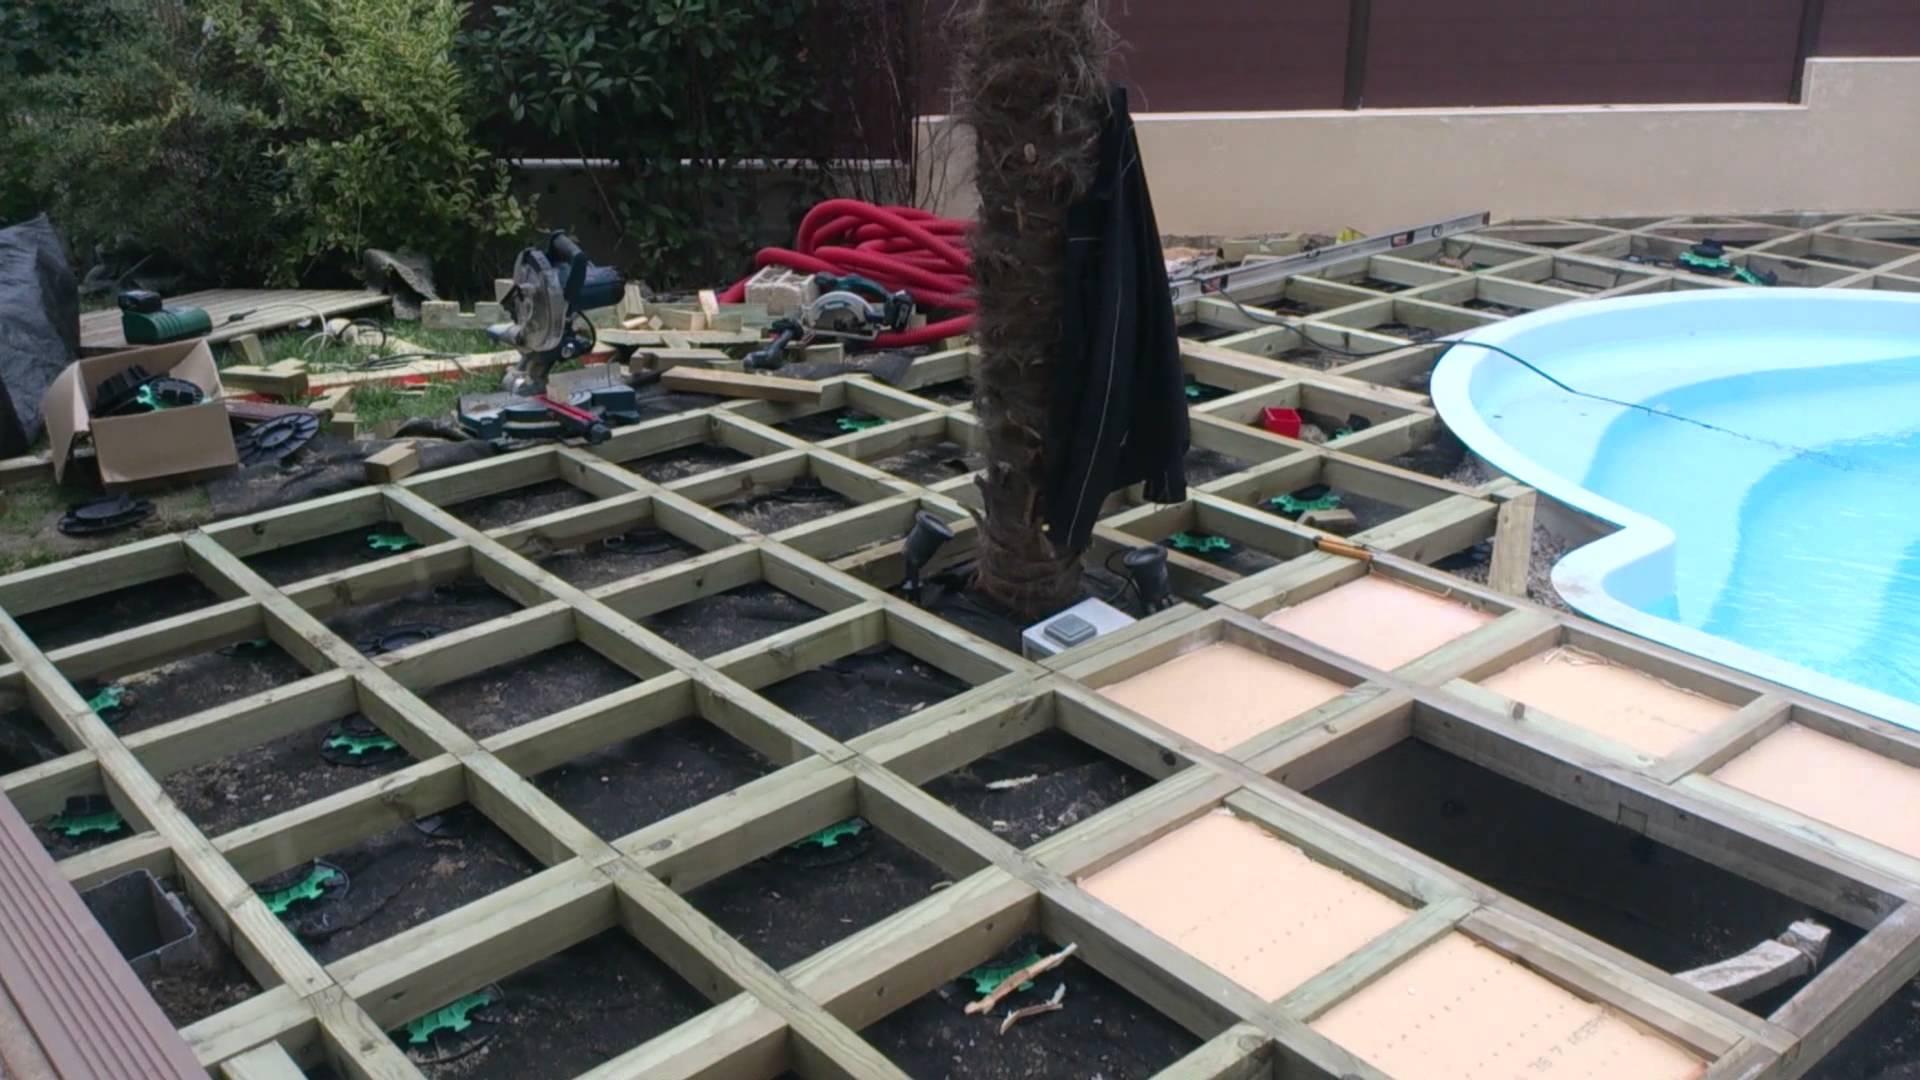 Construire une plage de piscine en bois jardin piscine - Comment faire une piscine pas cher ...